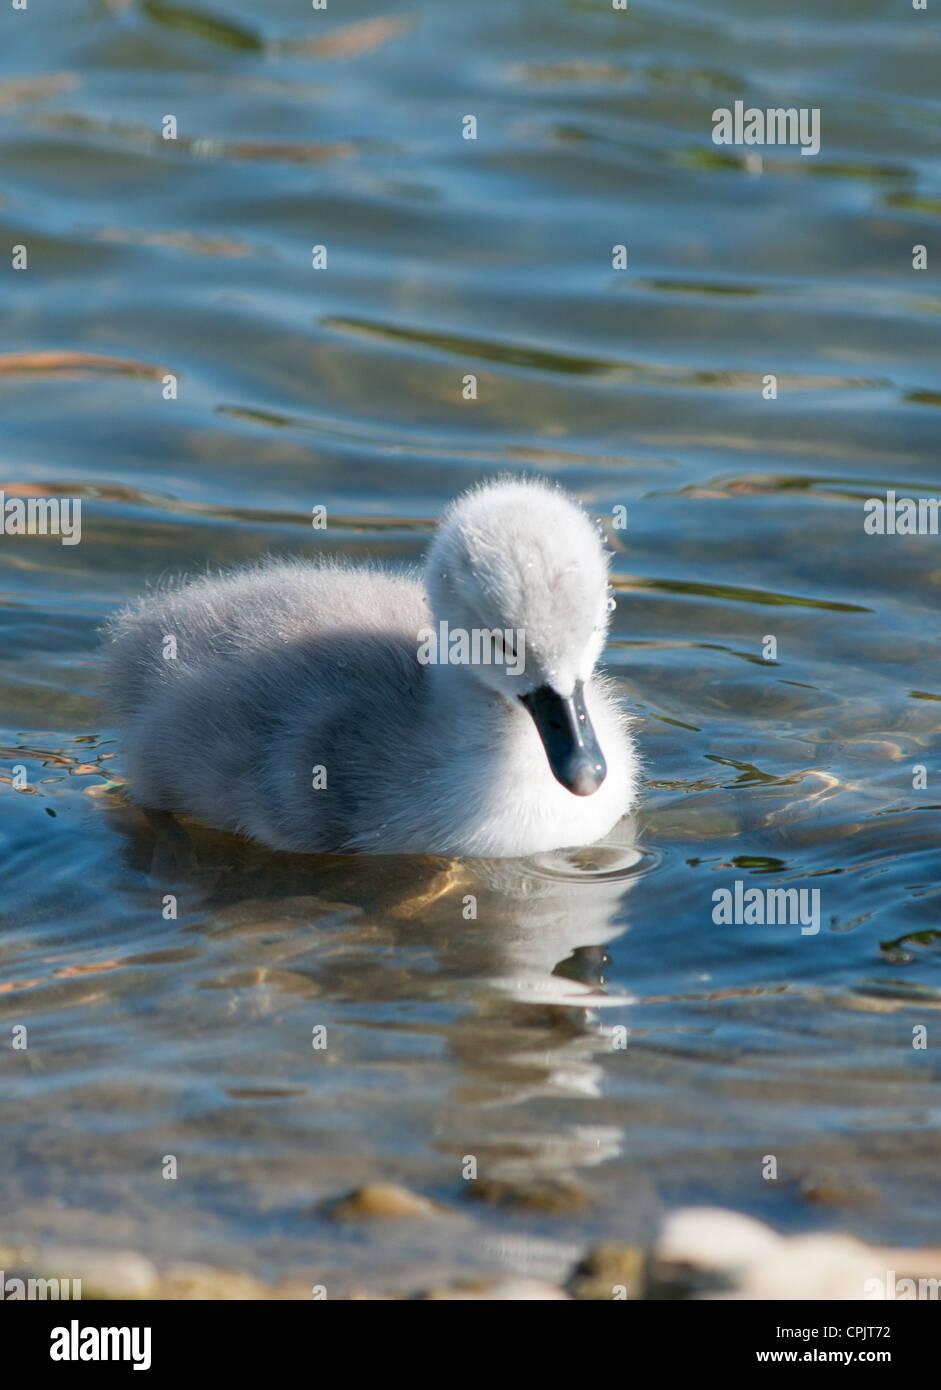 Baby Swan (signet) only 2 days old, Cambourne, Cambridgeshire. UK. Stock Photo